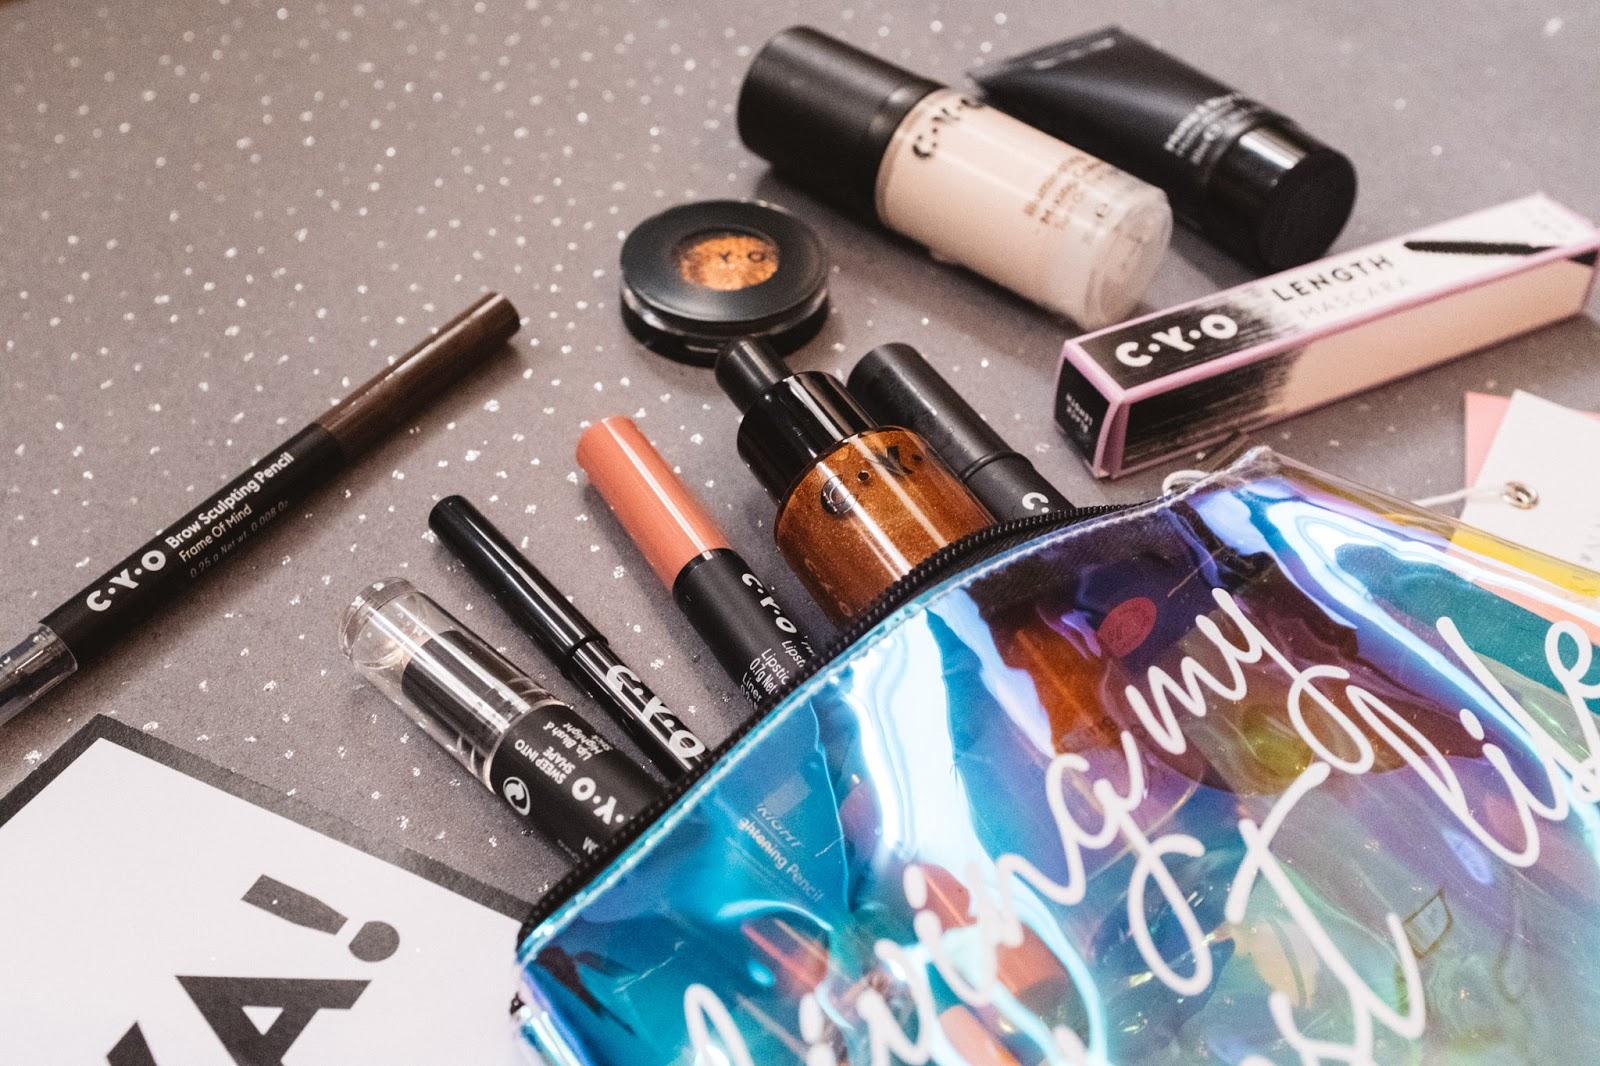 CYO makeup blogger review